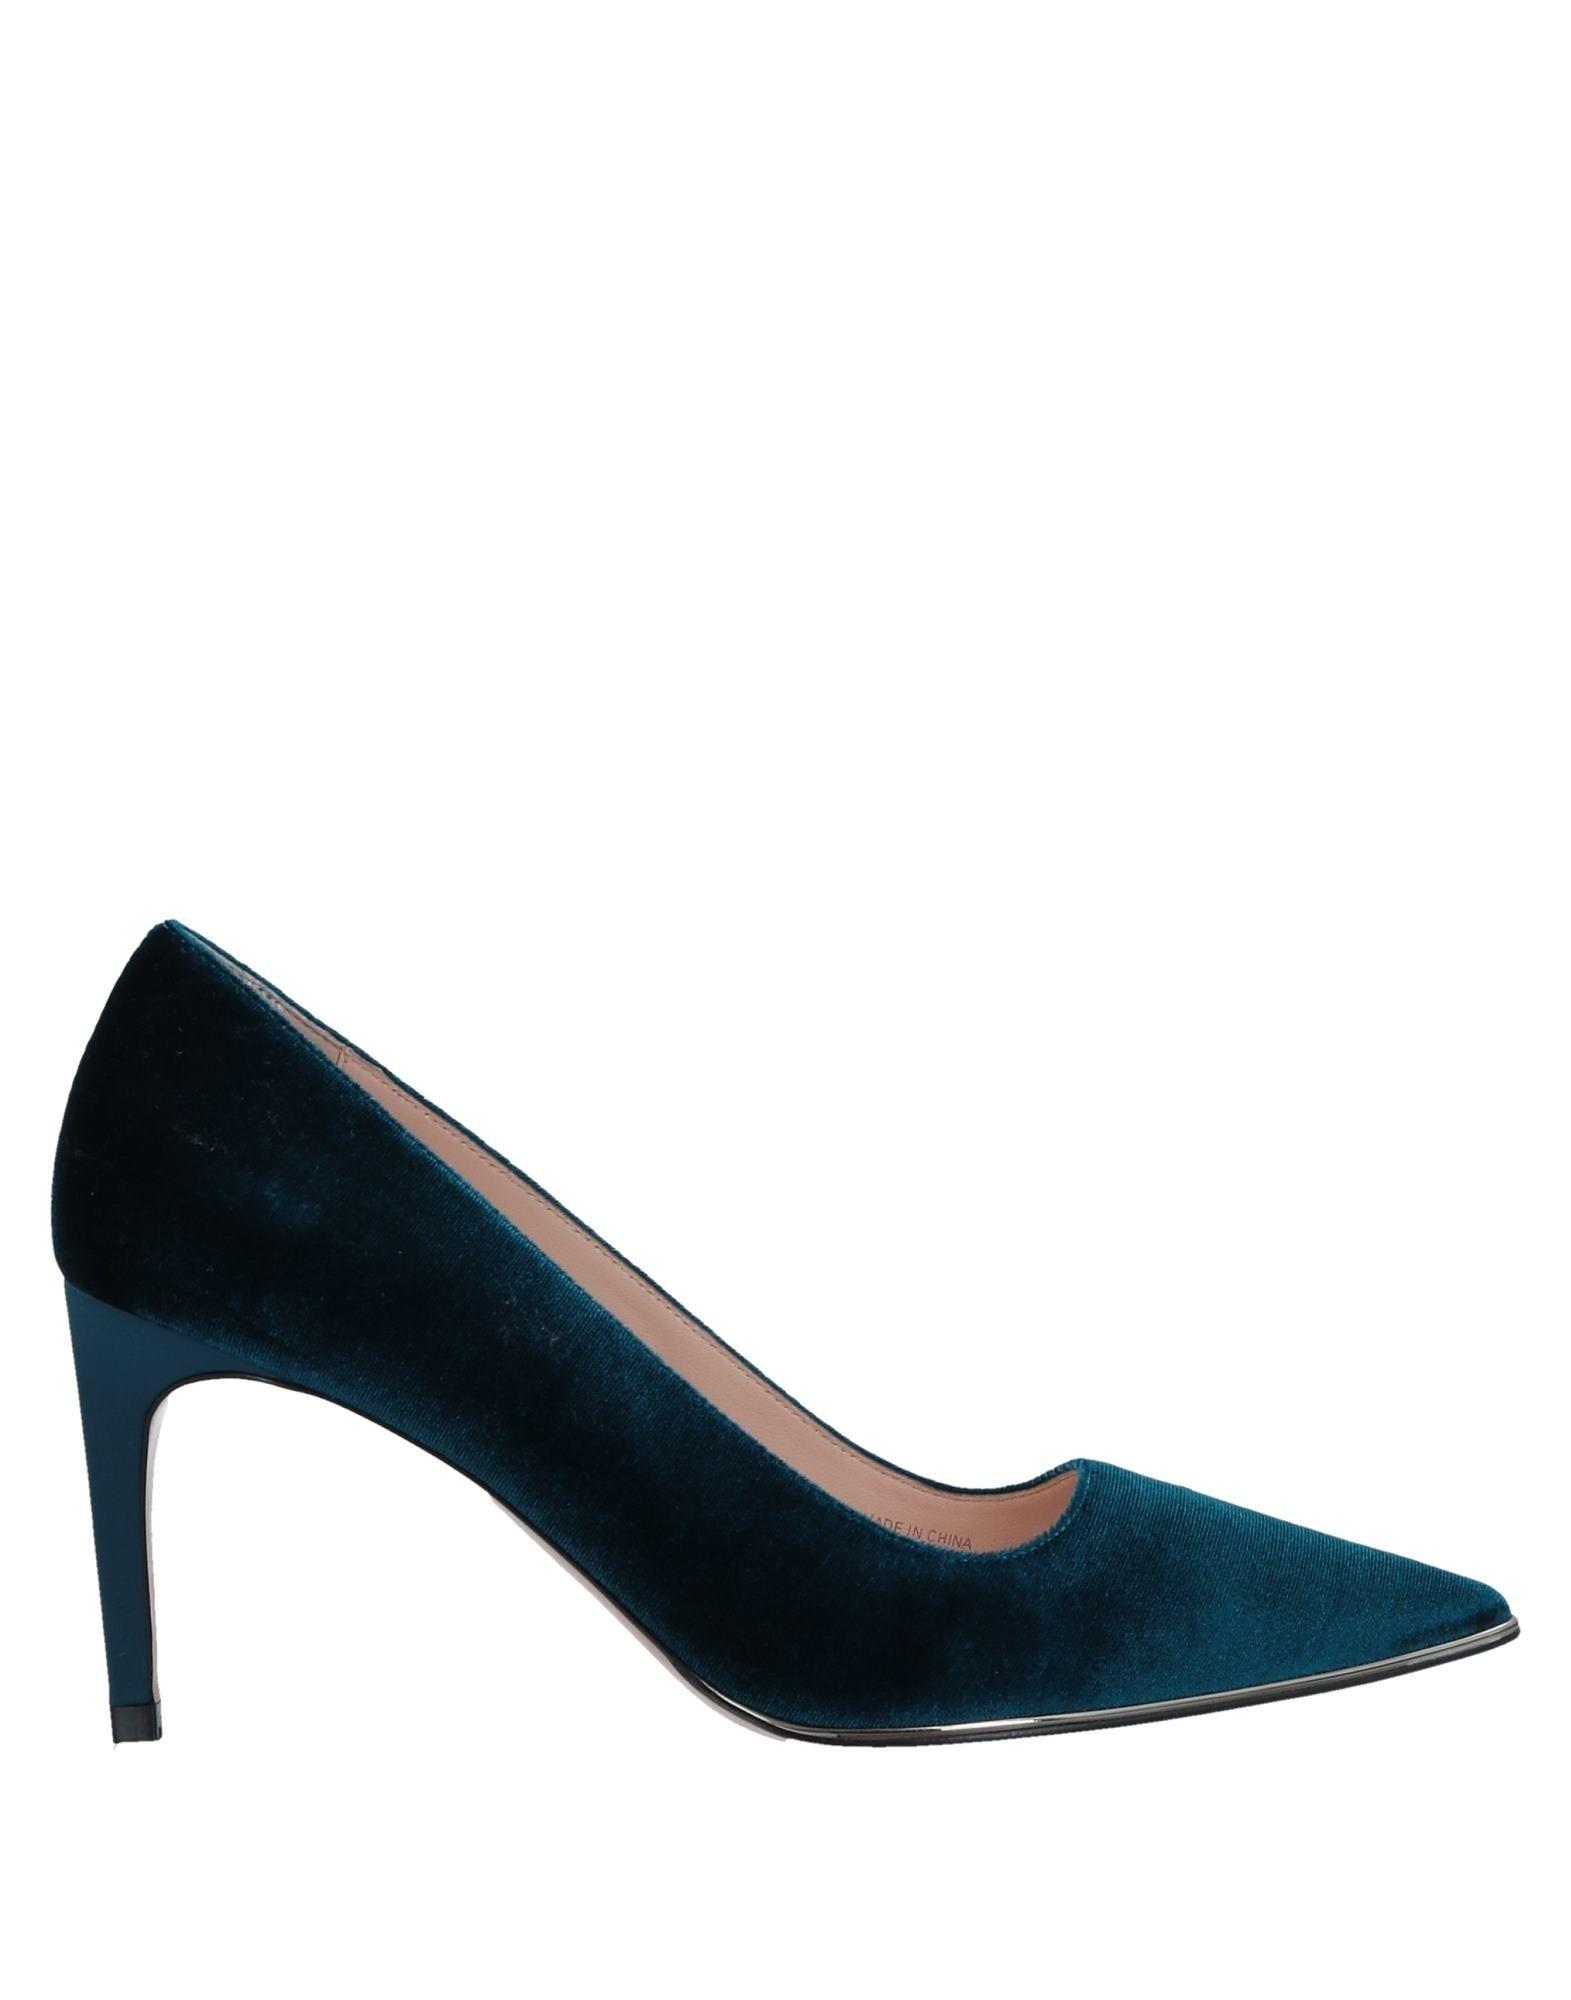 Stilvolle billige Damen Schuhe Carlo Pazolini Pumps Damen billige  11519153NL c91398